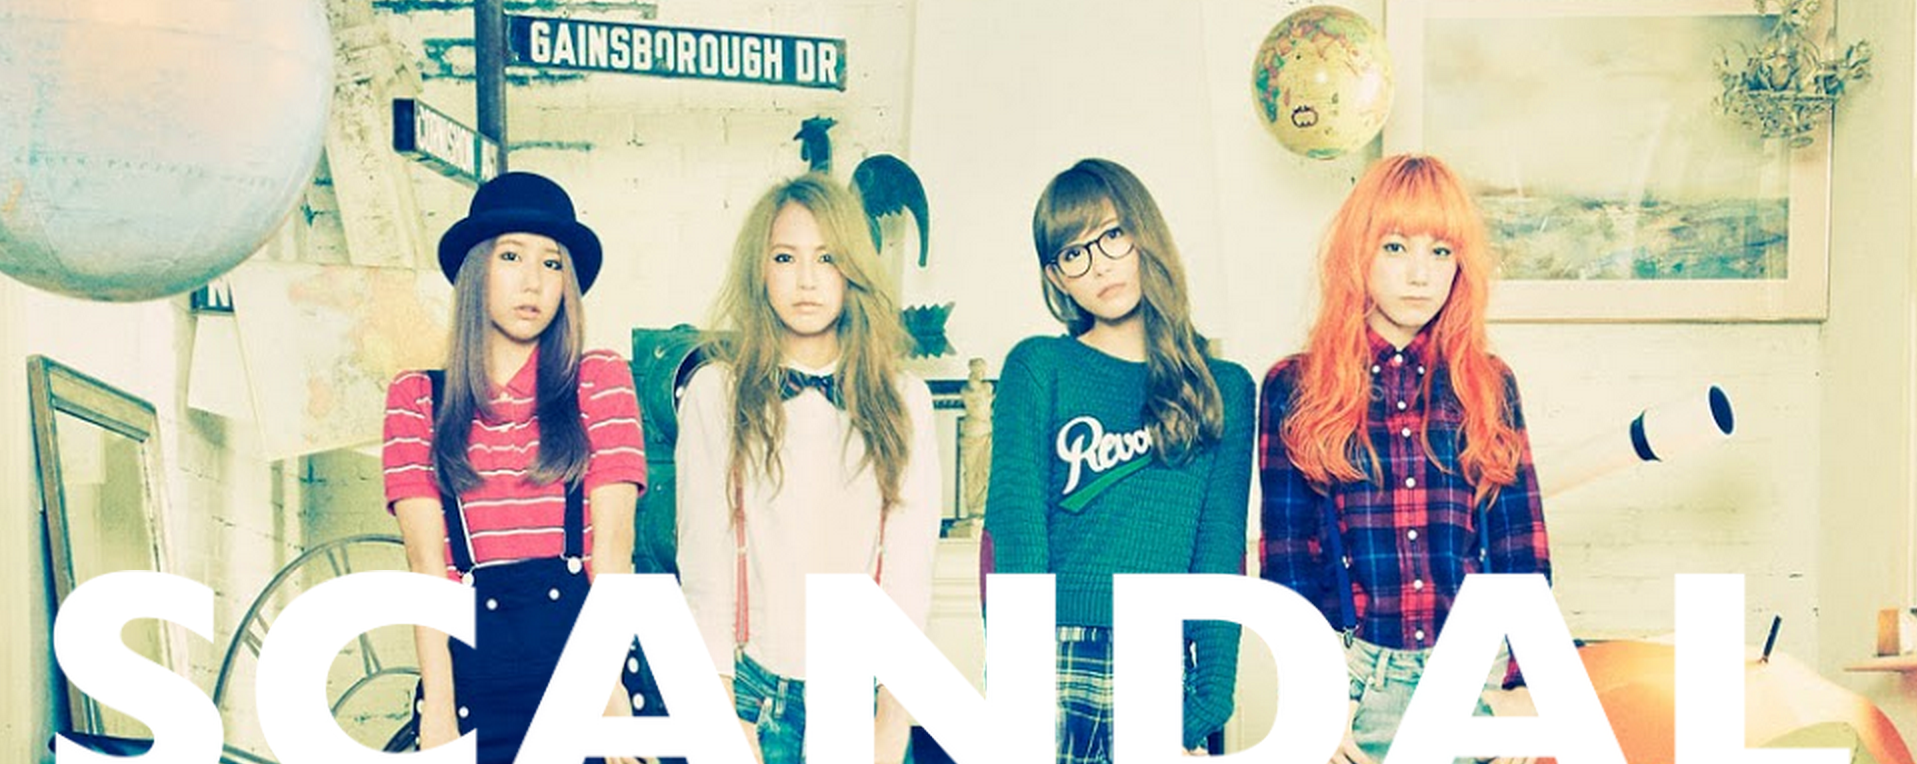 SCANDAL WORLD TOUR 2015 In Singapore